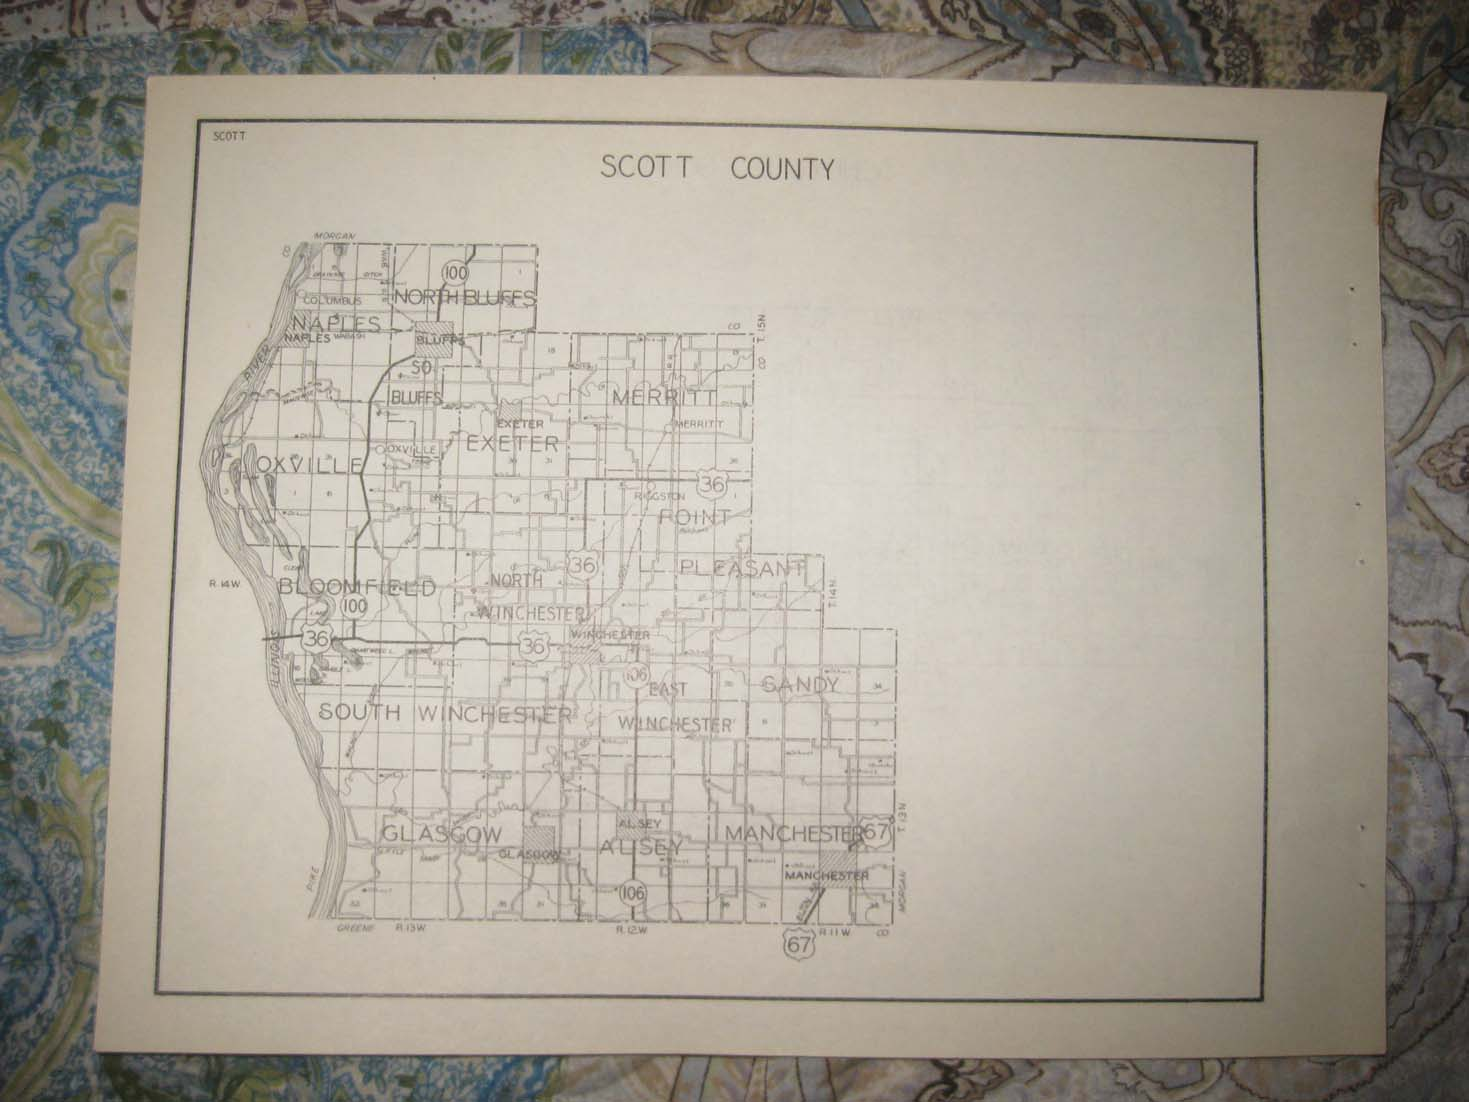 ANTIQUE 1931 SCHUYLER SCOTT COUNTY ILLINOIS HIGHWAY ROAD MAP ...